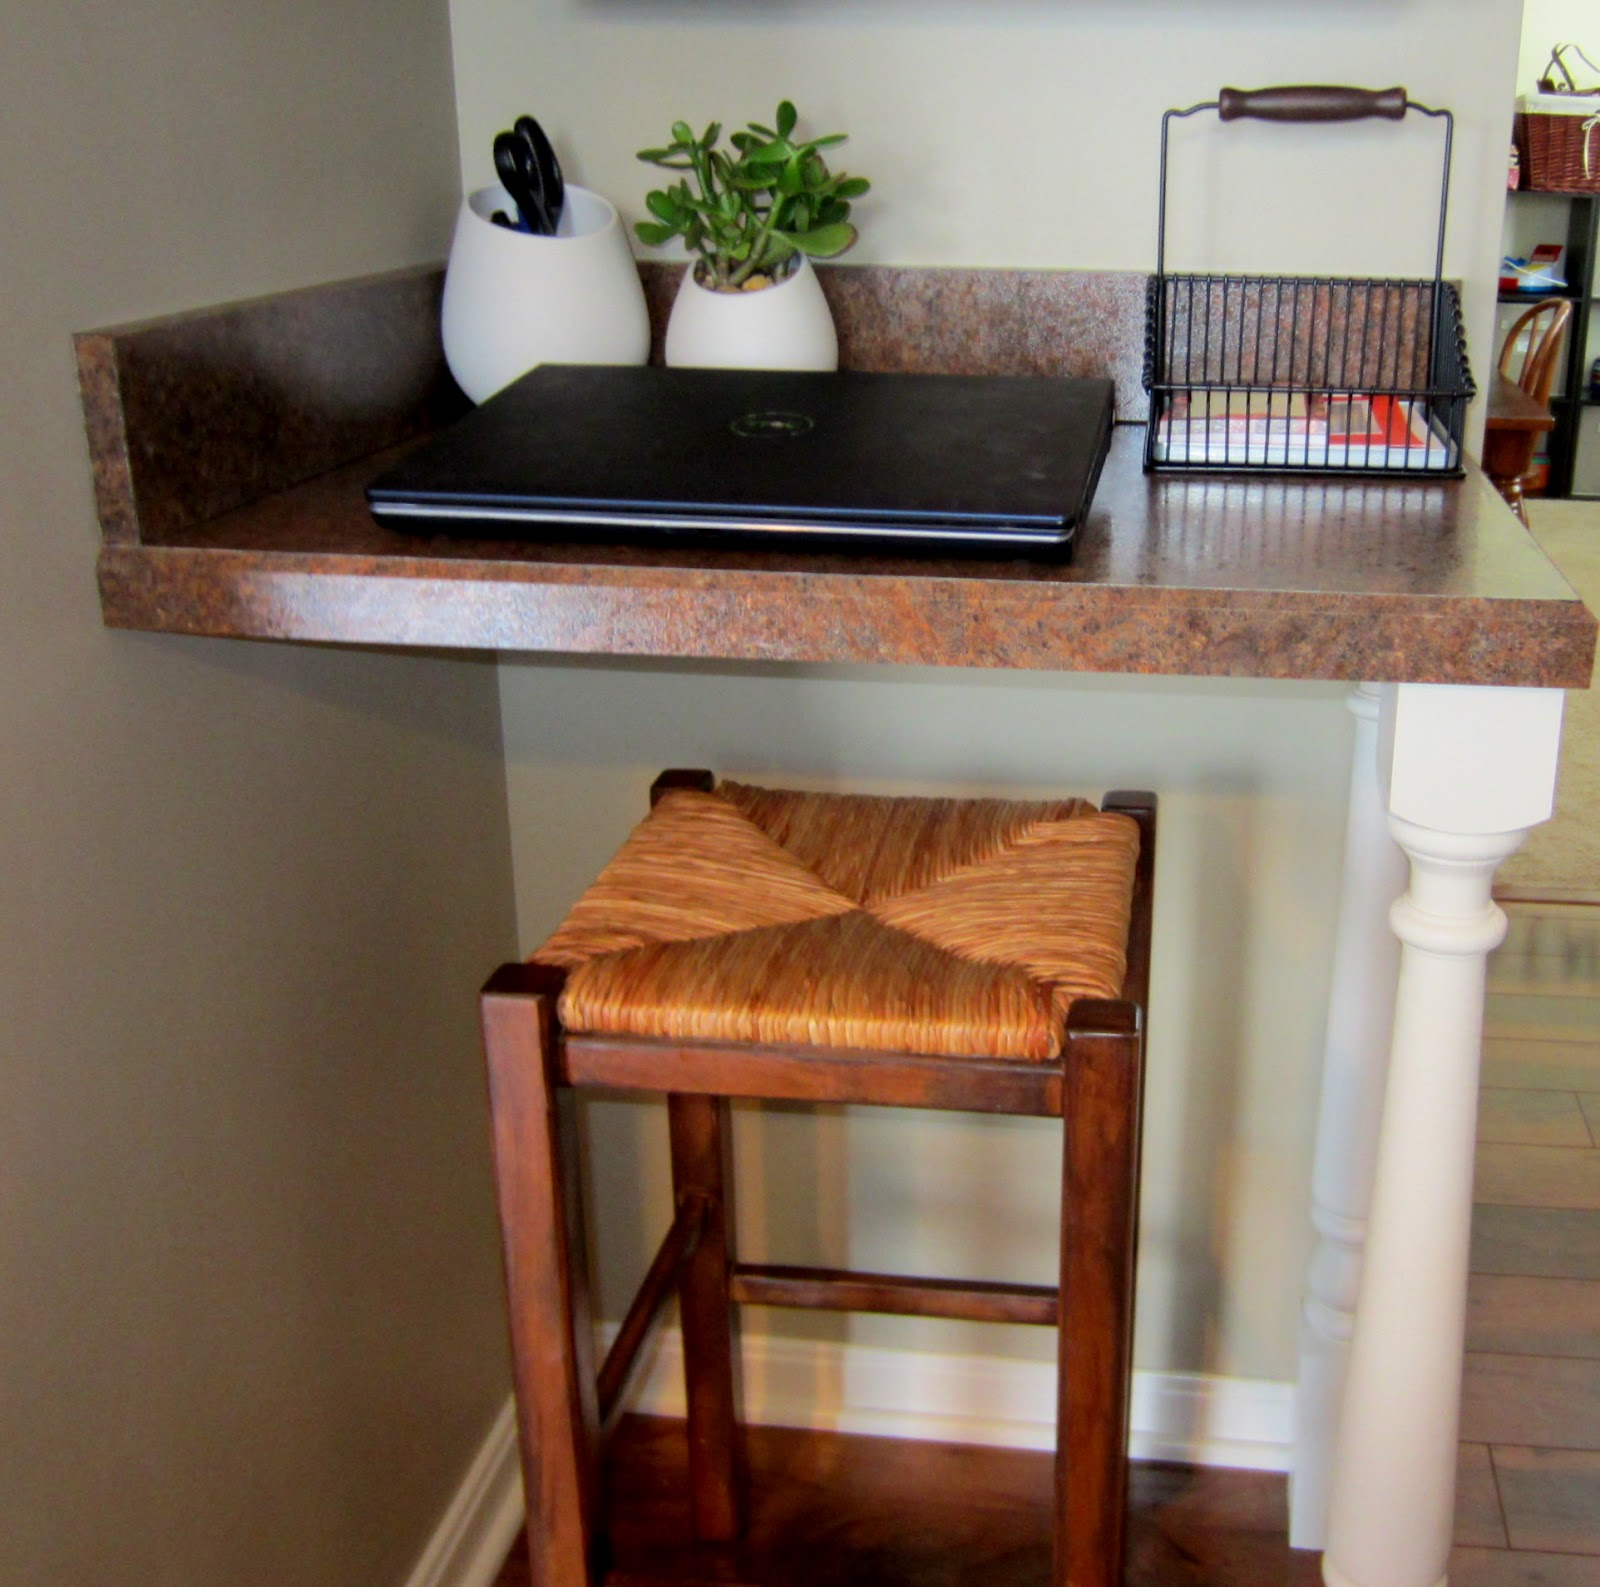 My Little Black Sweats: Mini-kitchen Addition DIY